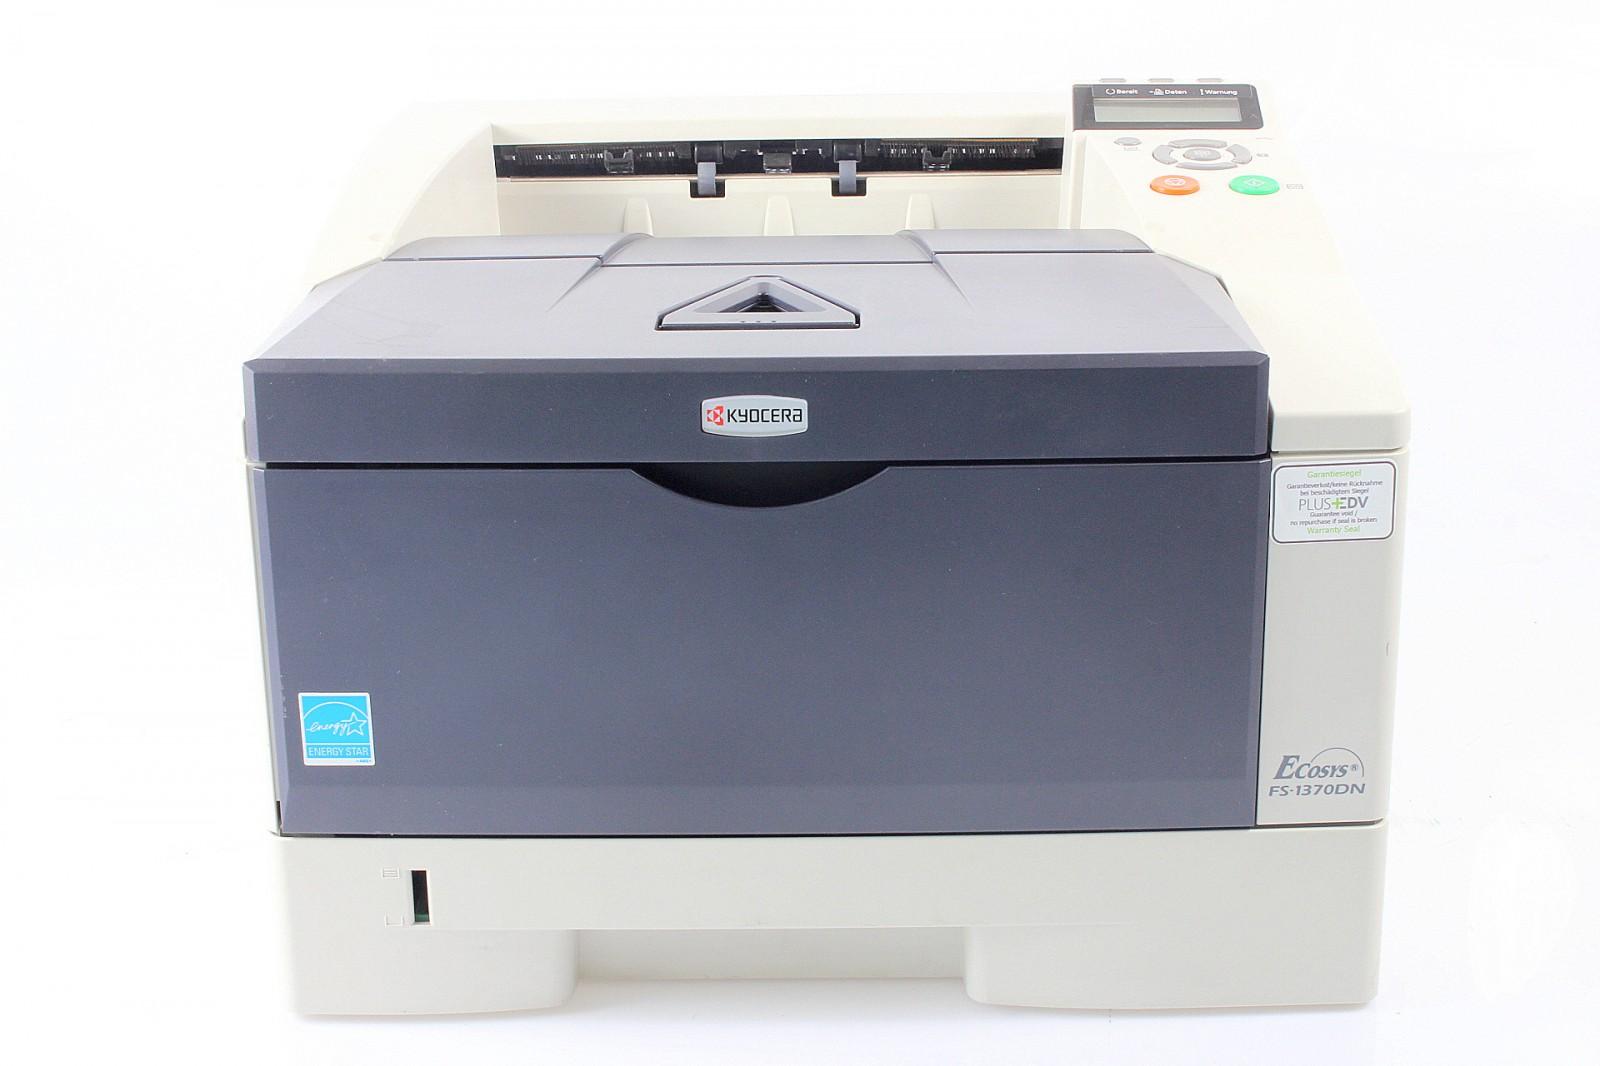 Kyocera Printer FS-1370DN driver